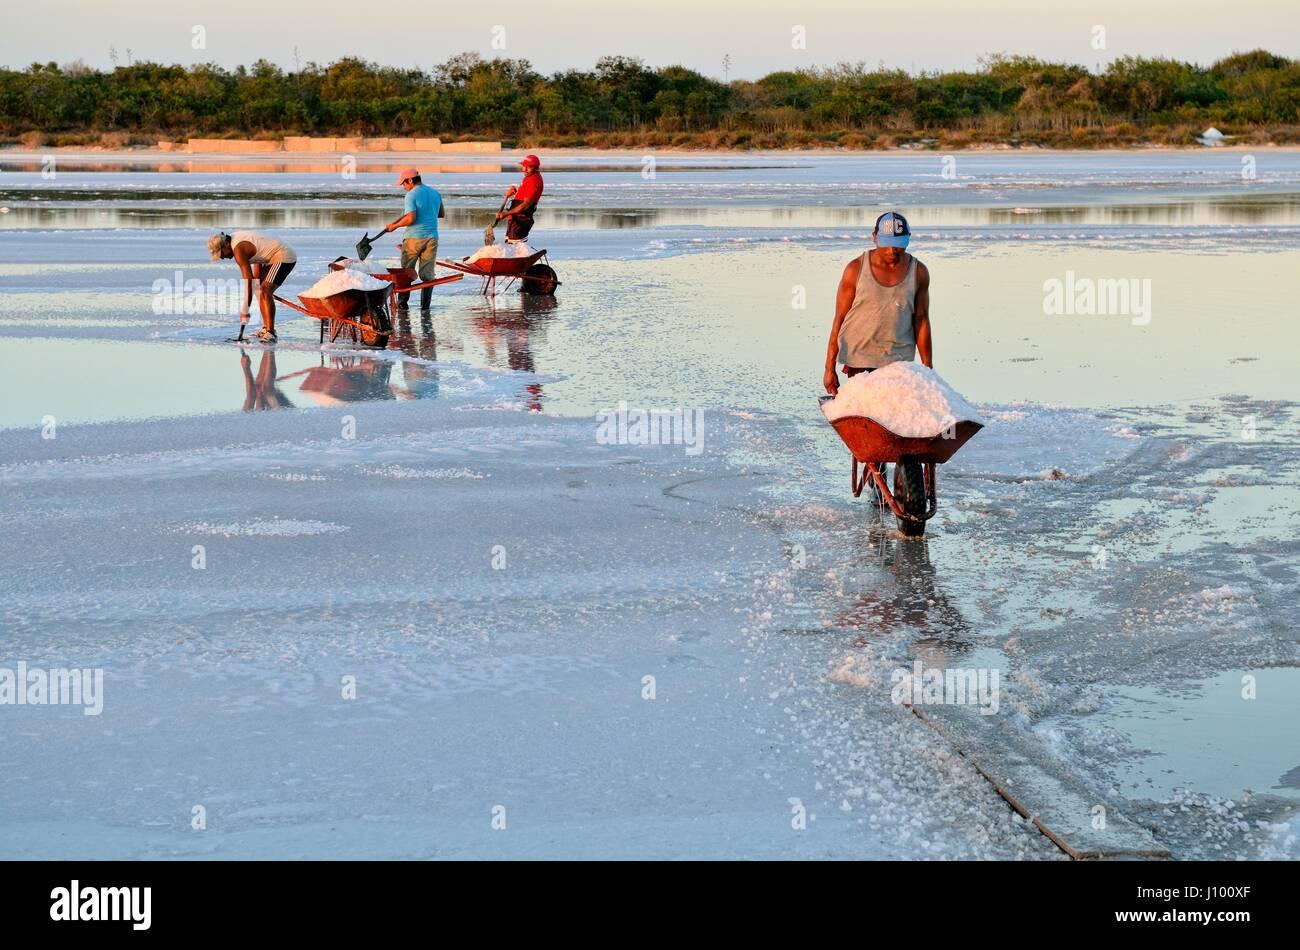 Workers shoveling salt in wheelbarrow, raw salt production, saline at El Cujo, Yukatan, Mexico - Stock Image